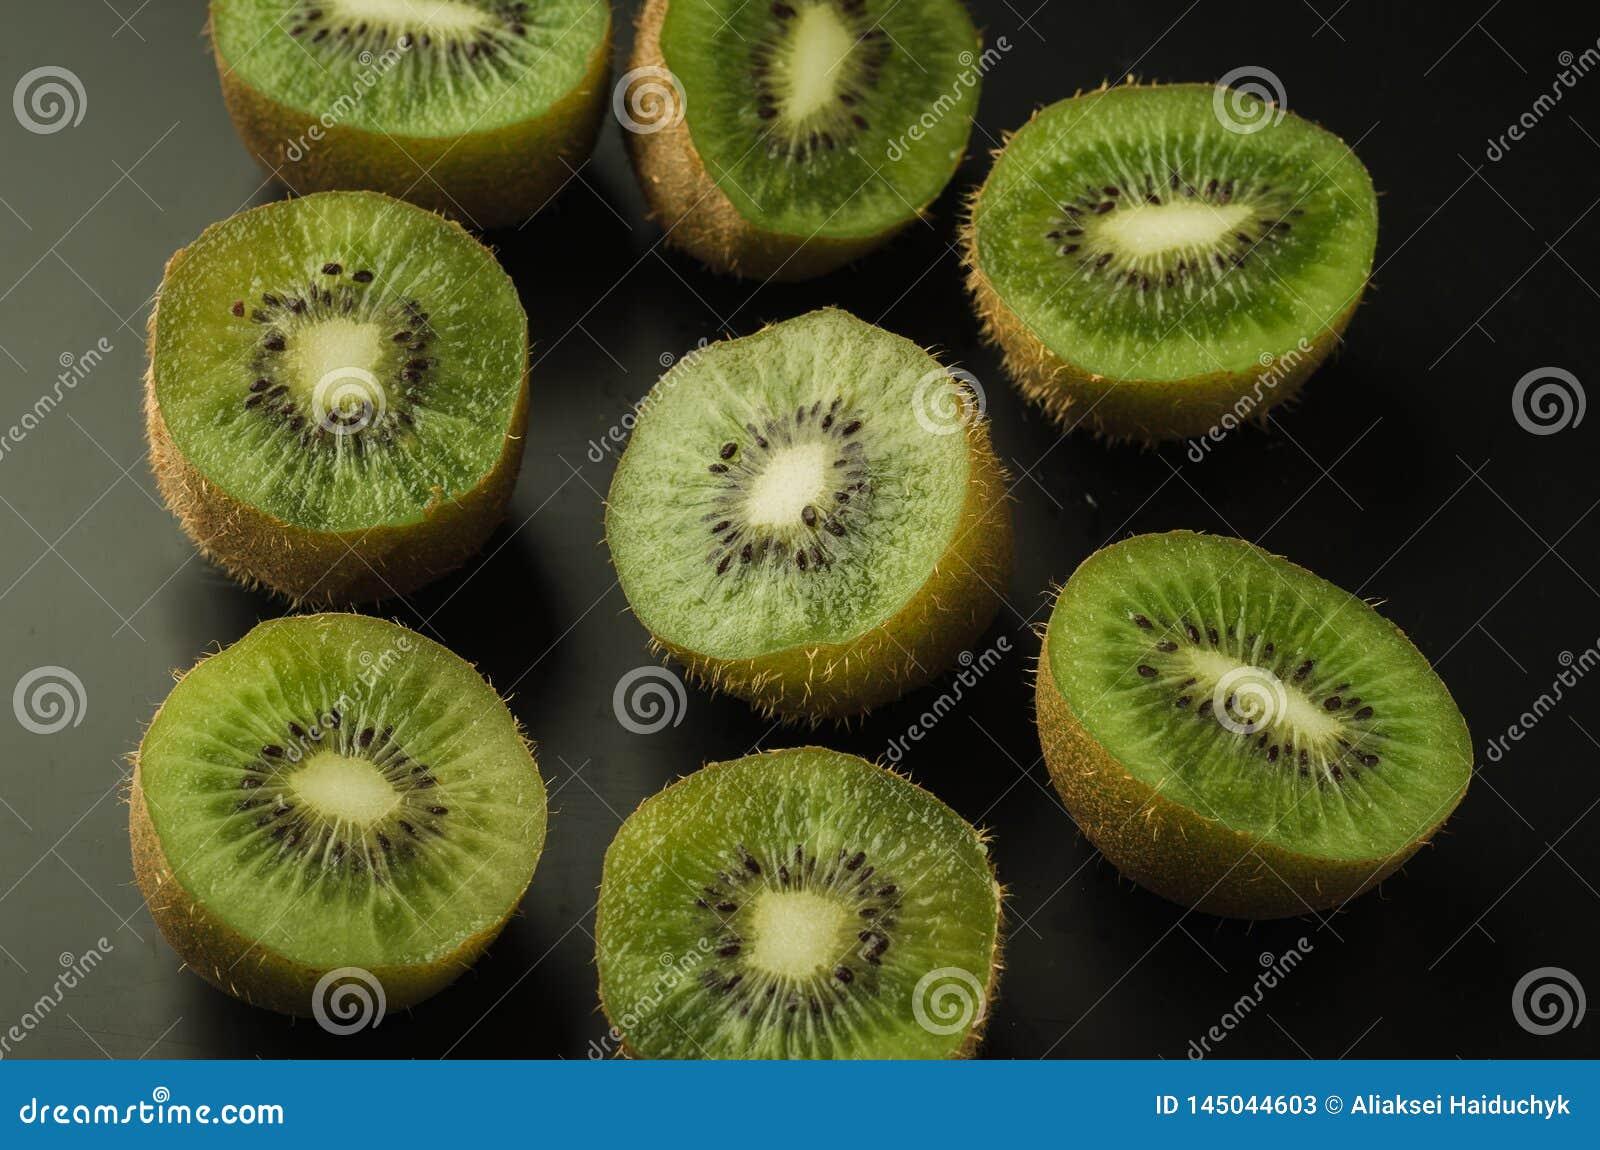 cut kiwi against black background/cut kiwi against black background. Top view